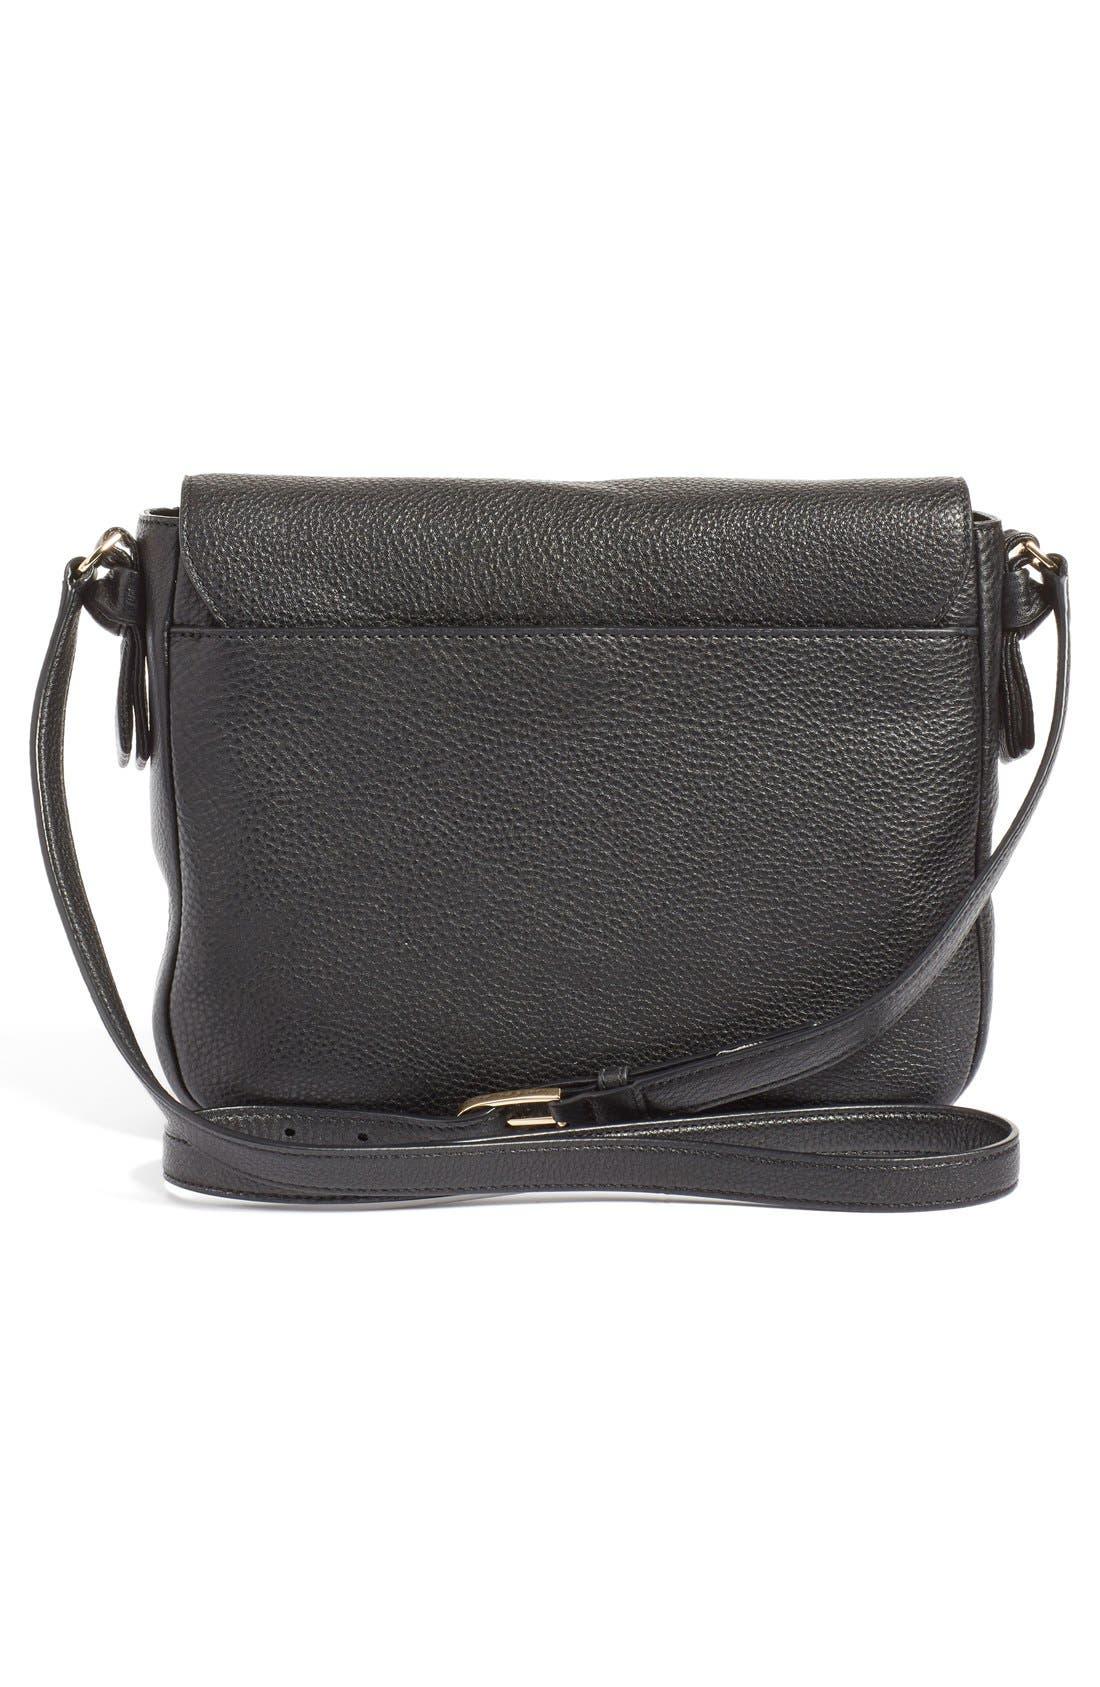 'Harper' Leather Crossbody Bag,                             Alternate thumbnail 5, color,                             012